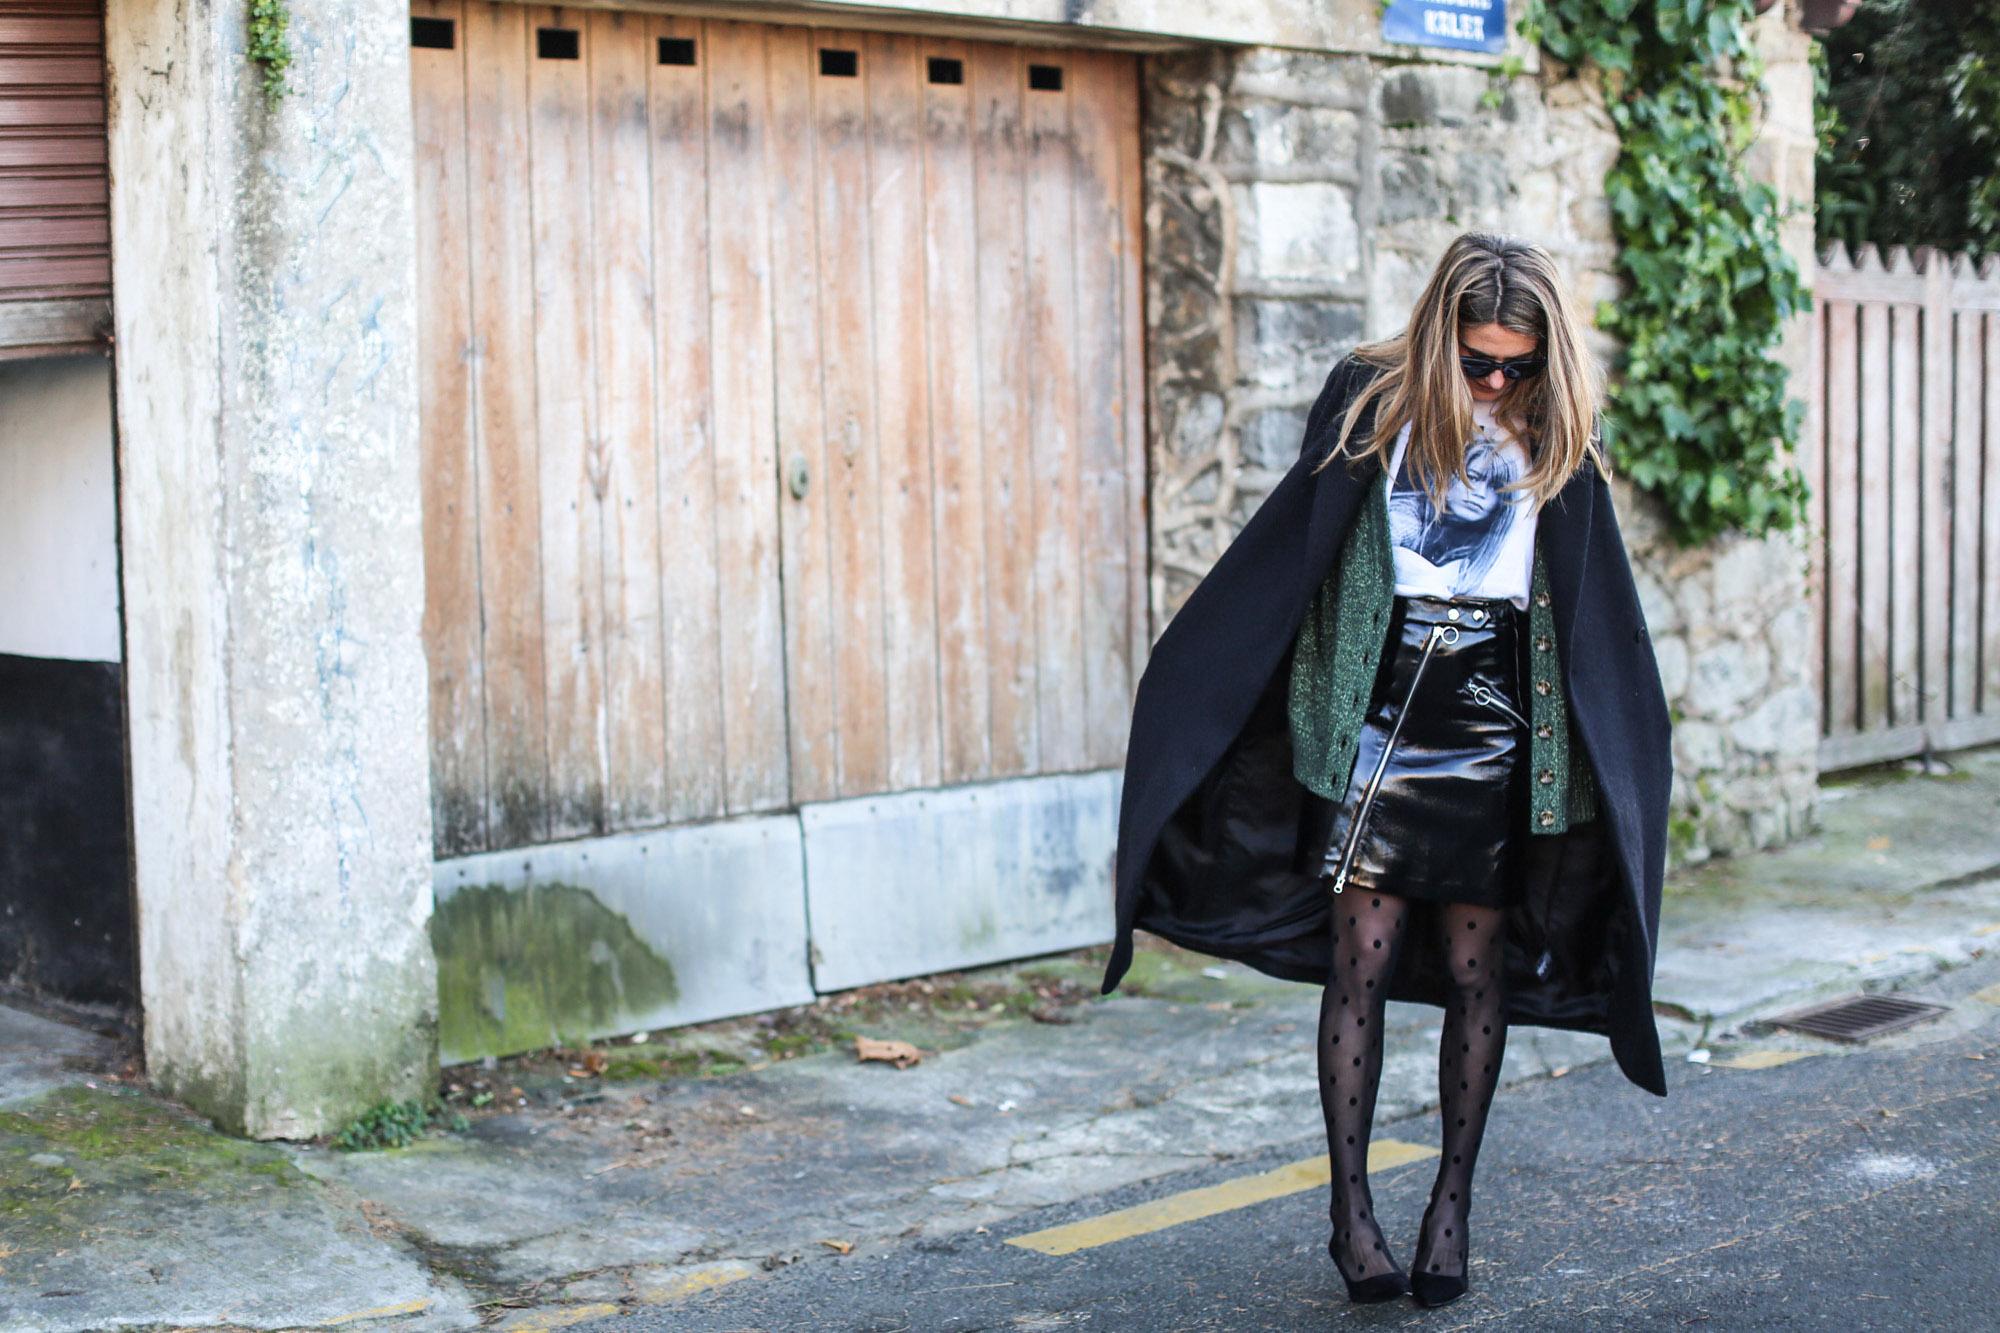 clochet_streetstyle_fashionblogger_minifaldarockeracharolzara_camiserahardypromod_abrigolargolanacos